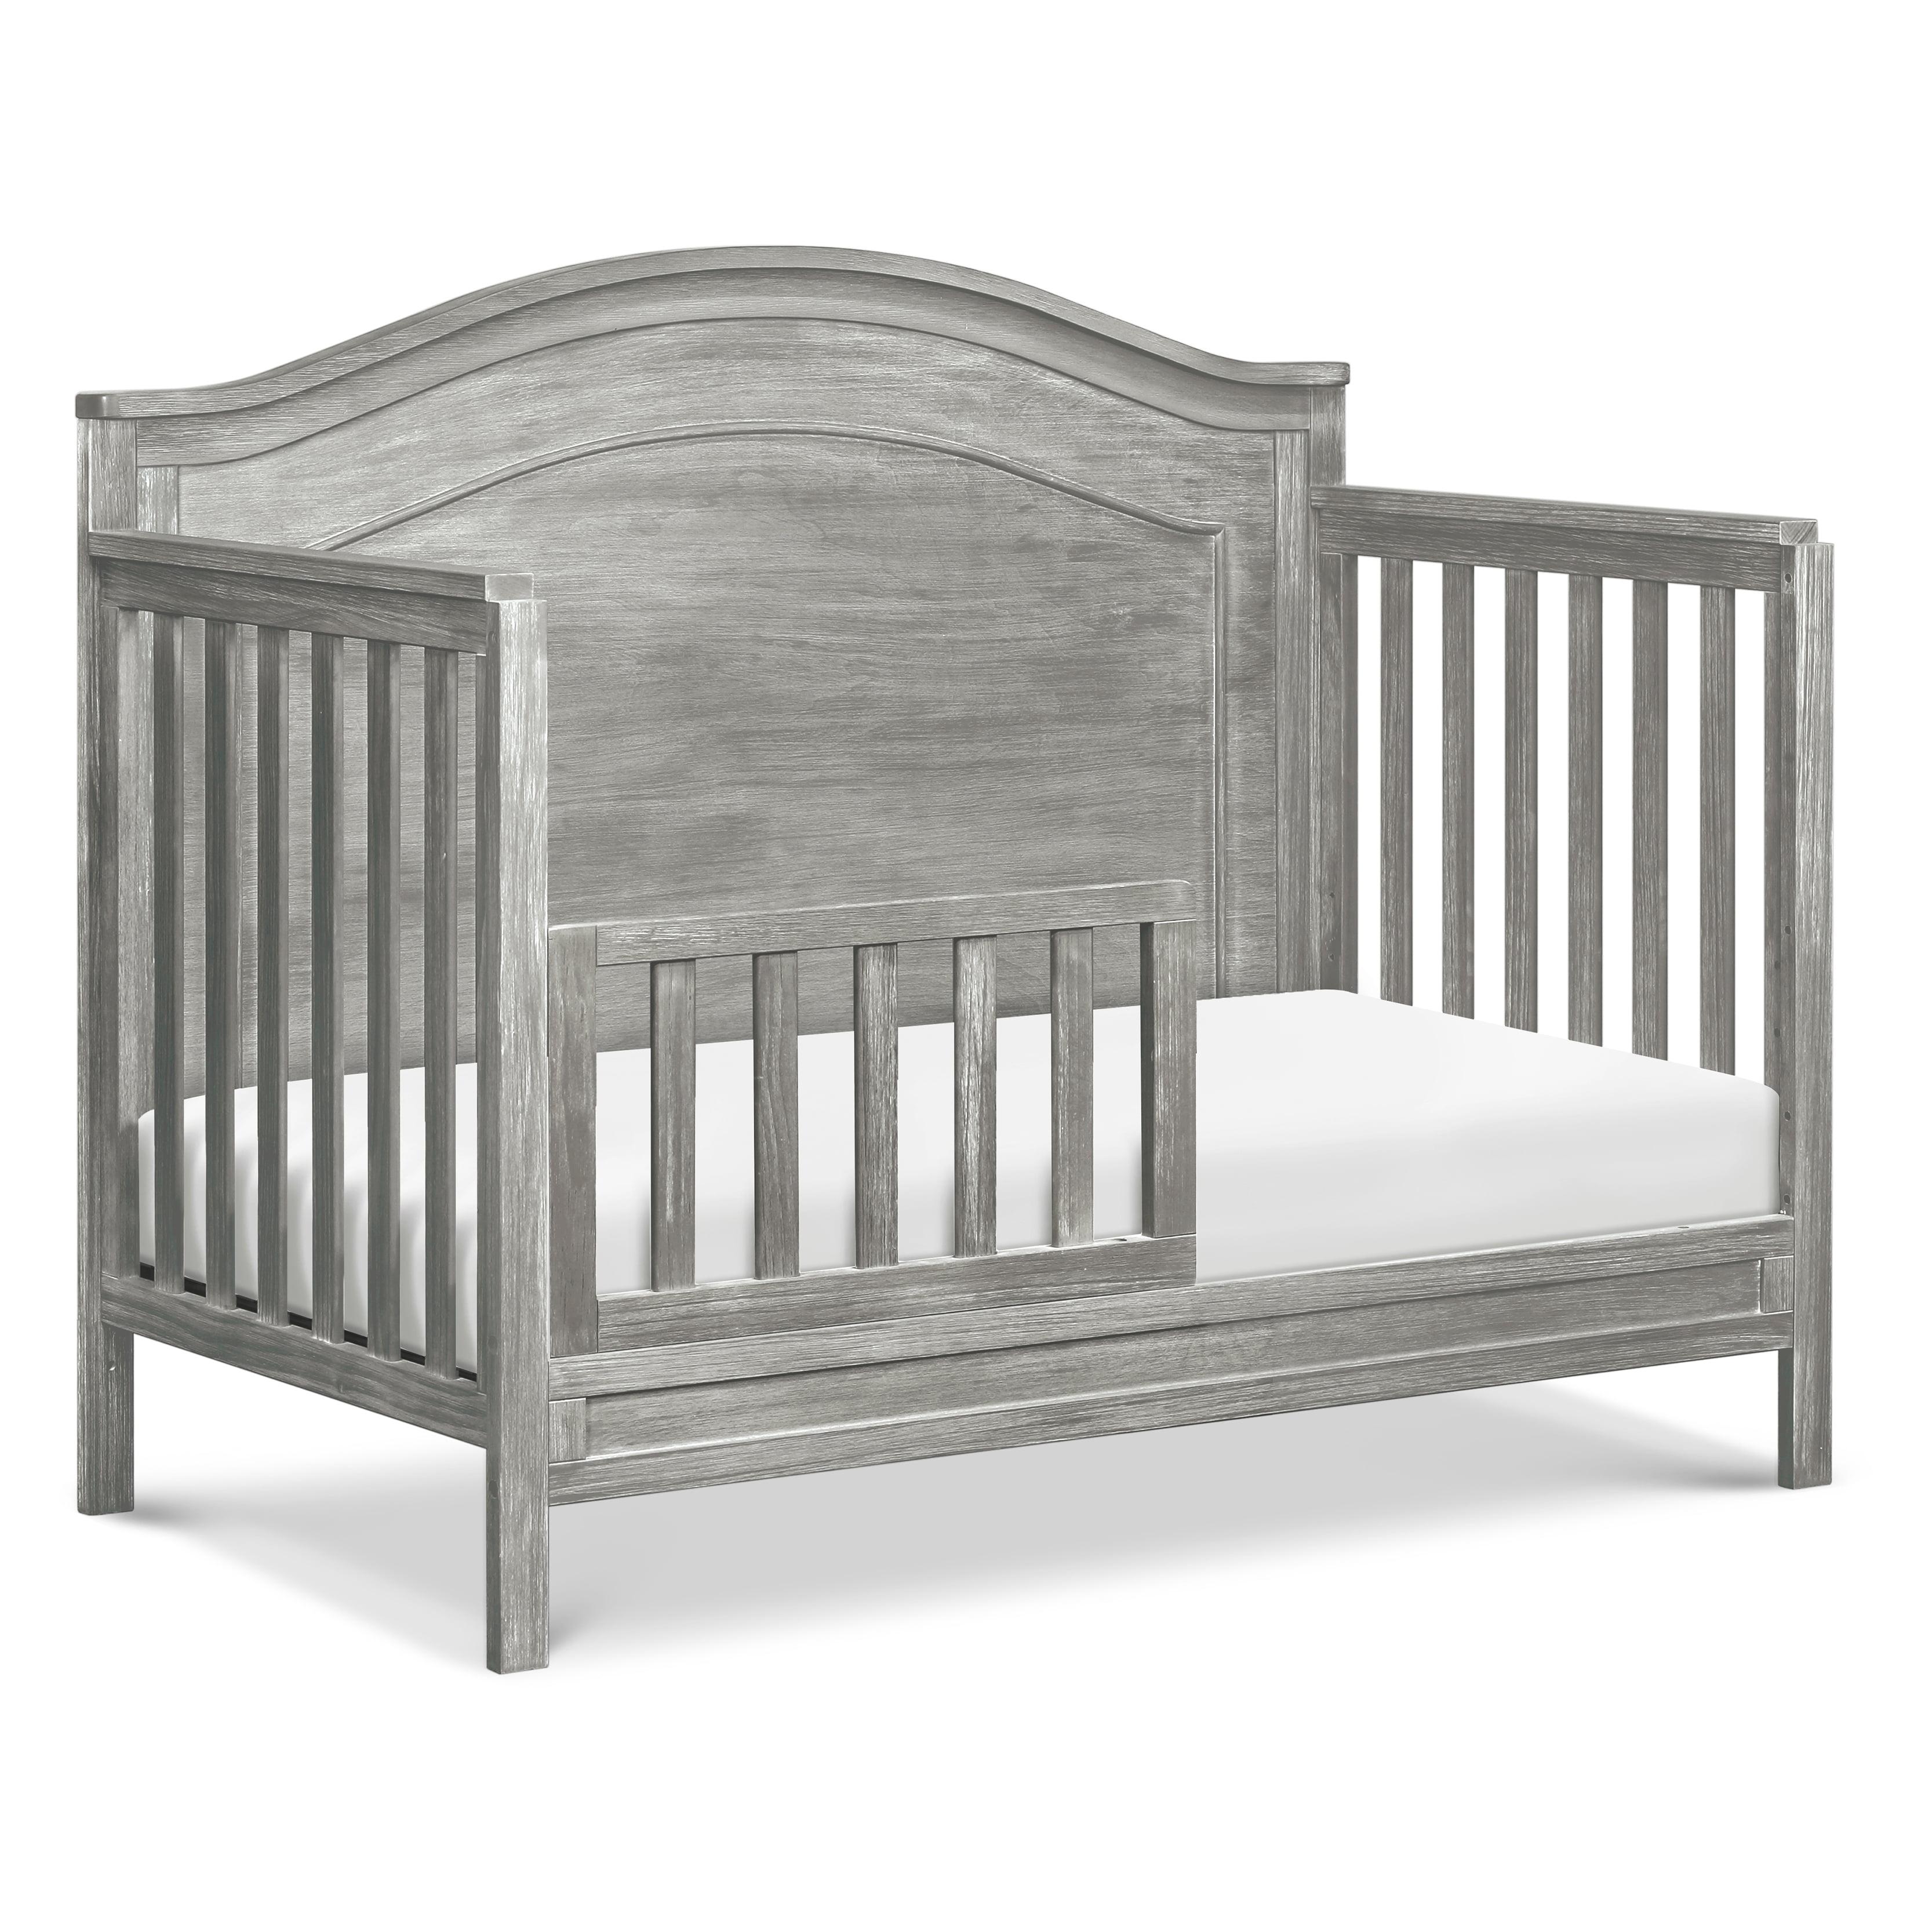 Rustic Pine DaVinci Charlie 4-in-1 Convertible Crib